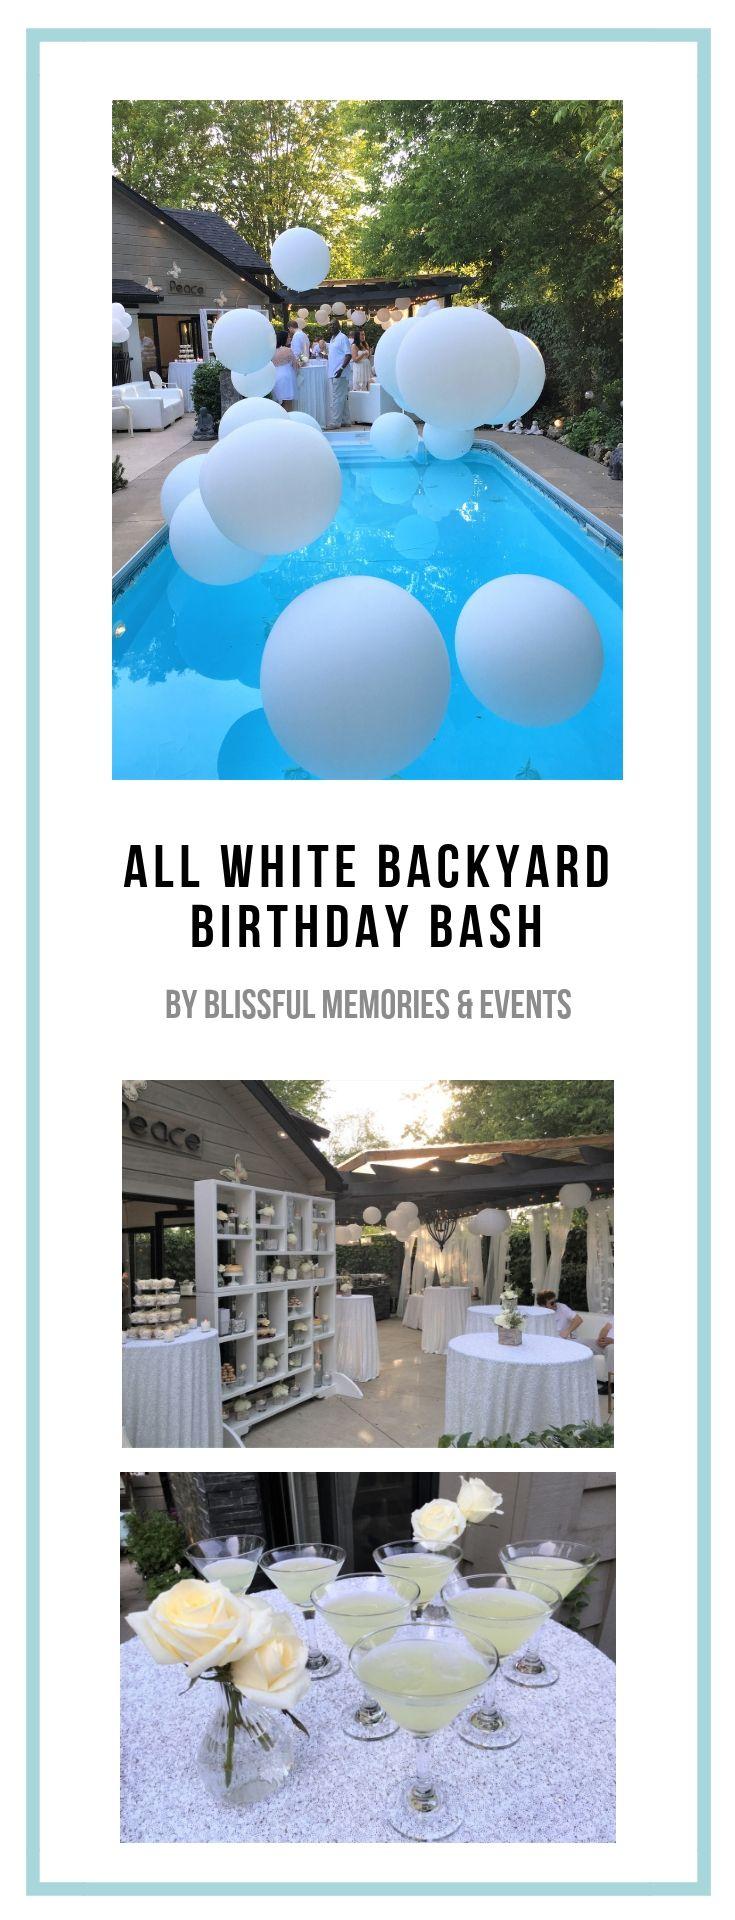 All White Backyard Birthday Bash Toronto On Blissful Memories